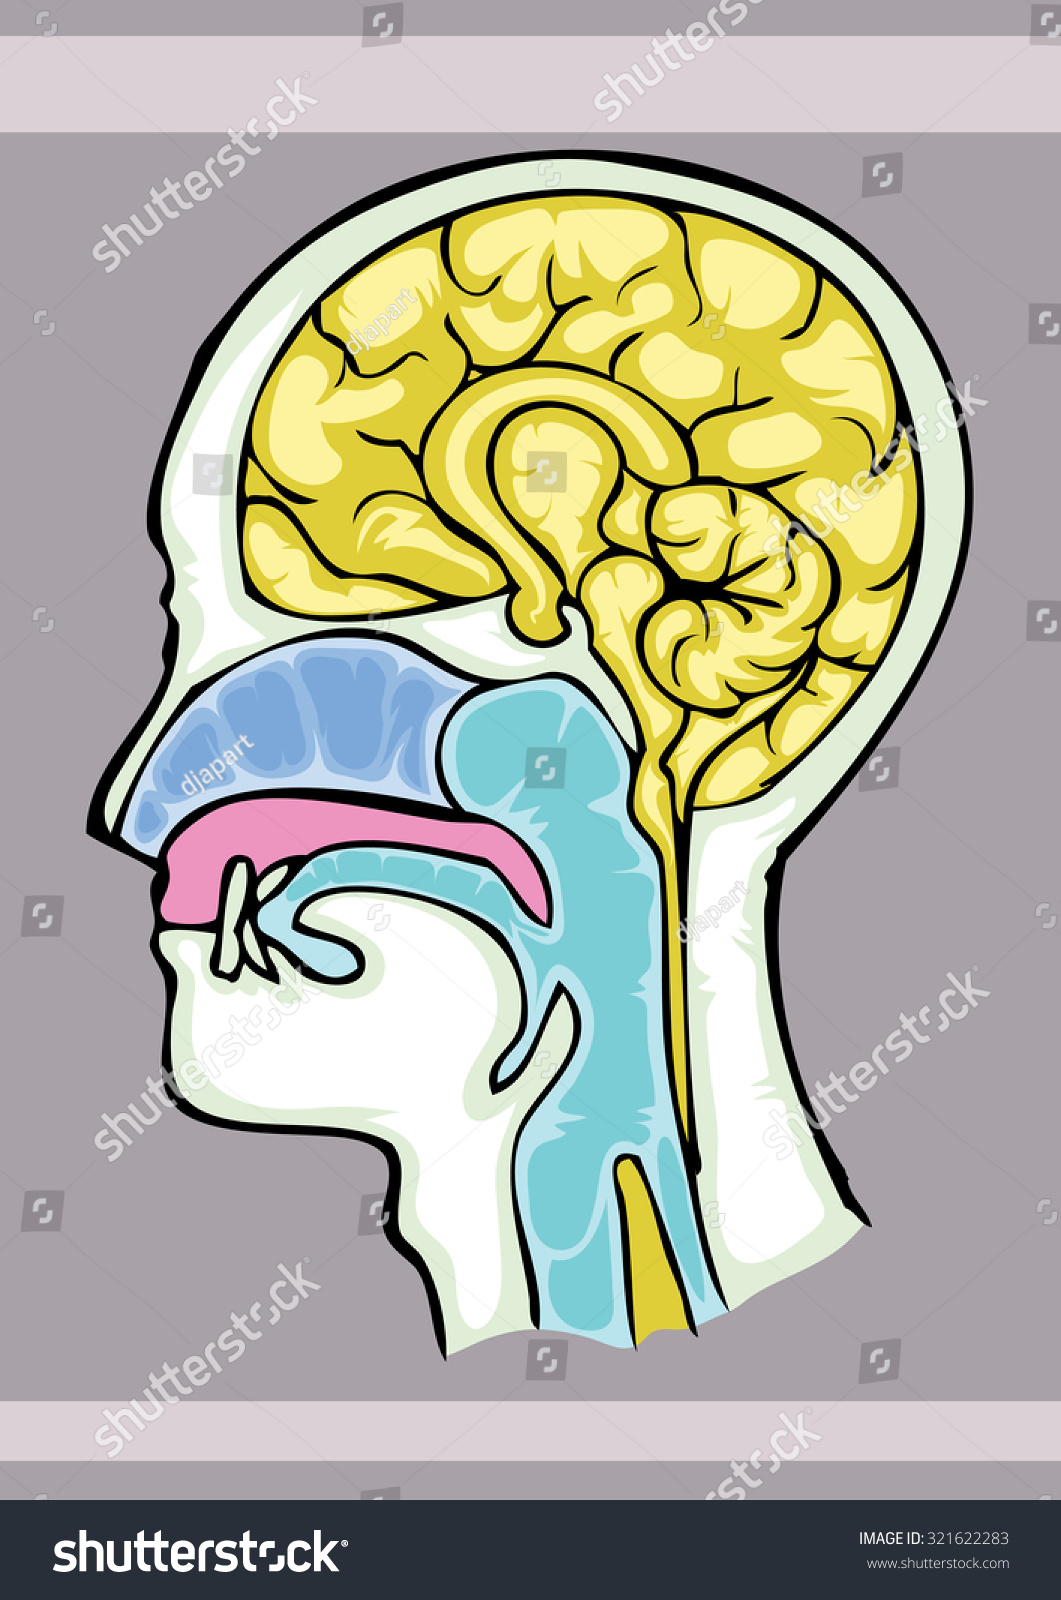 Brain in a vat essay